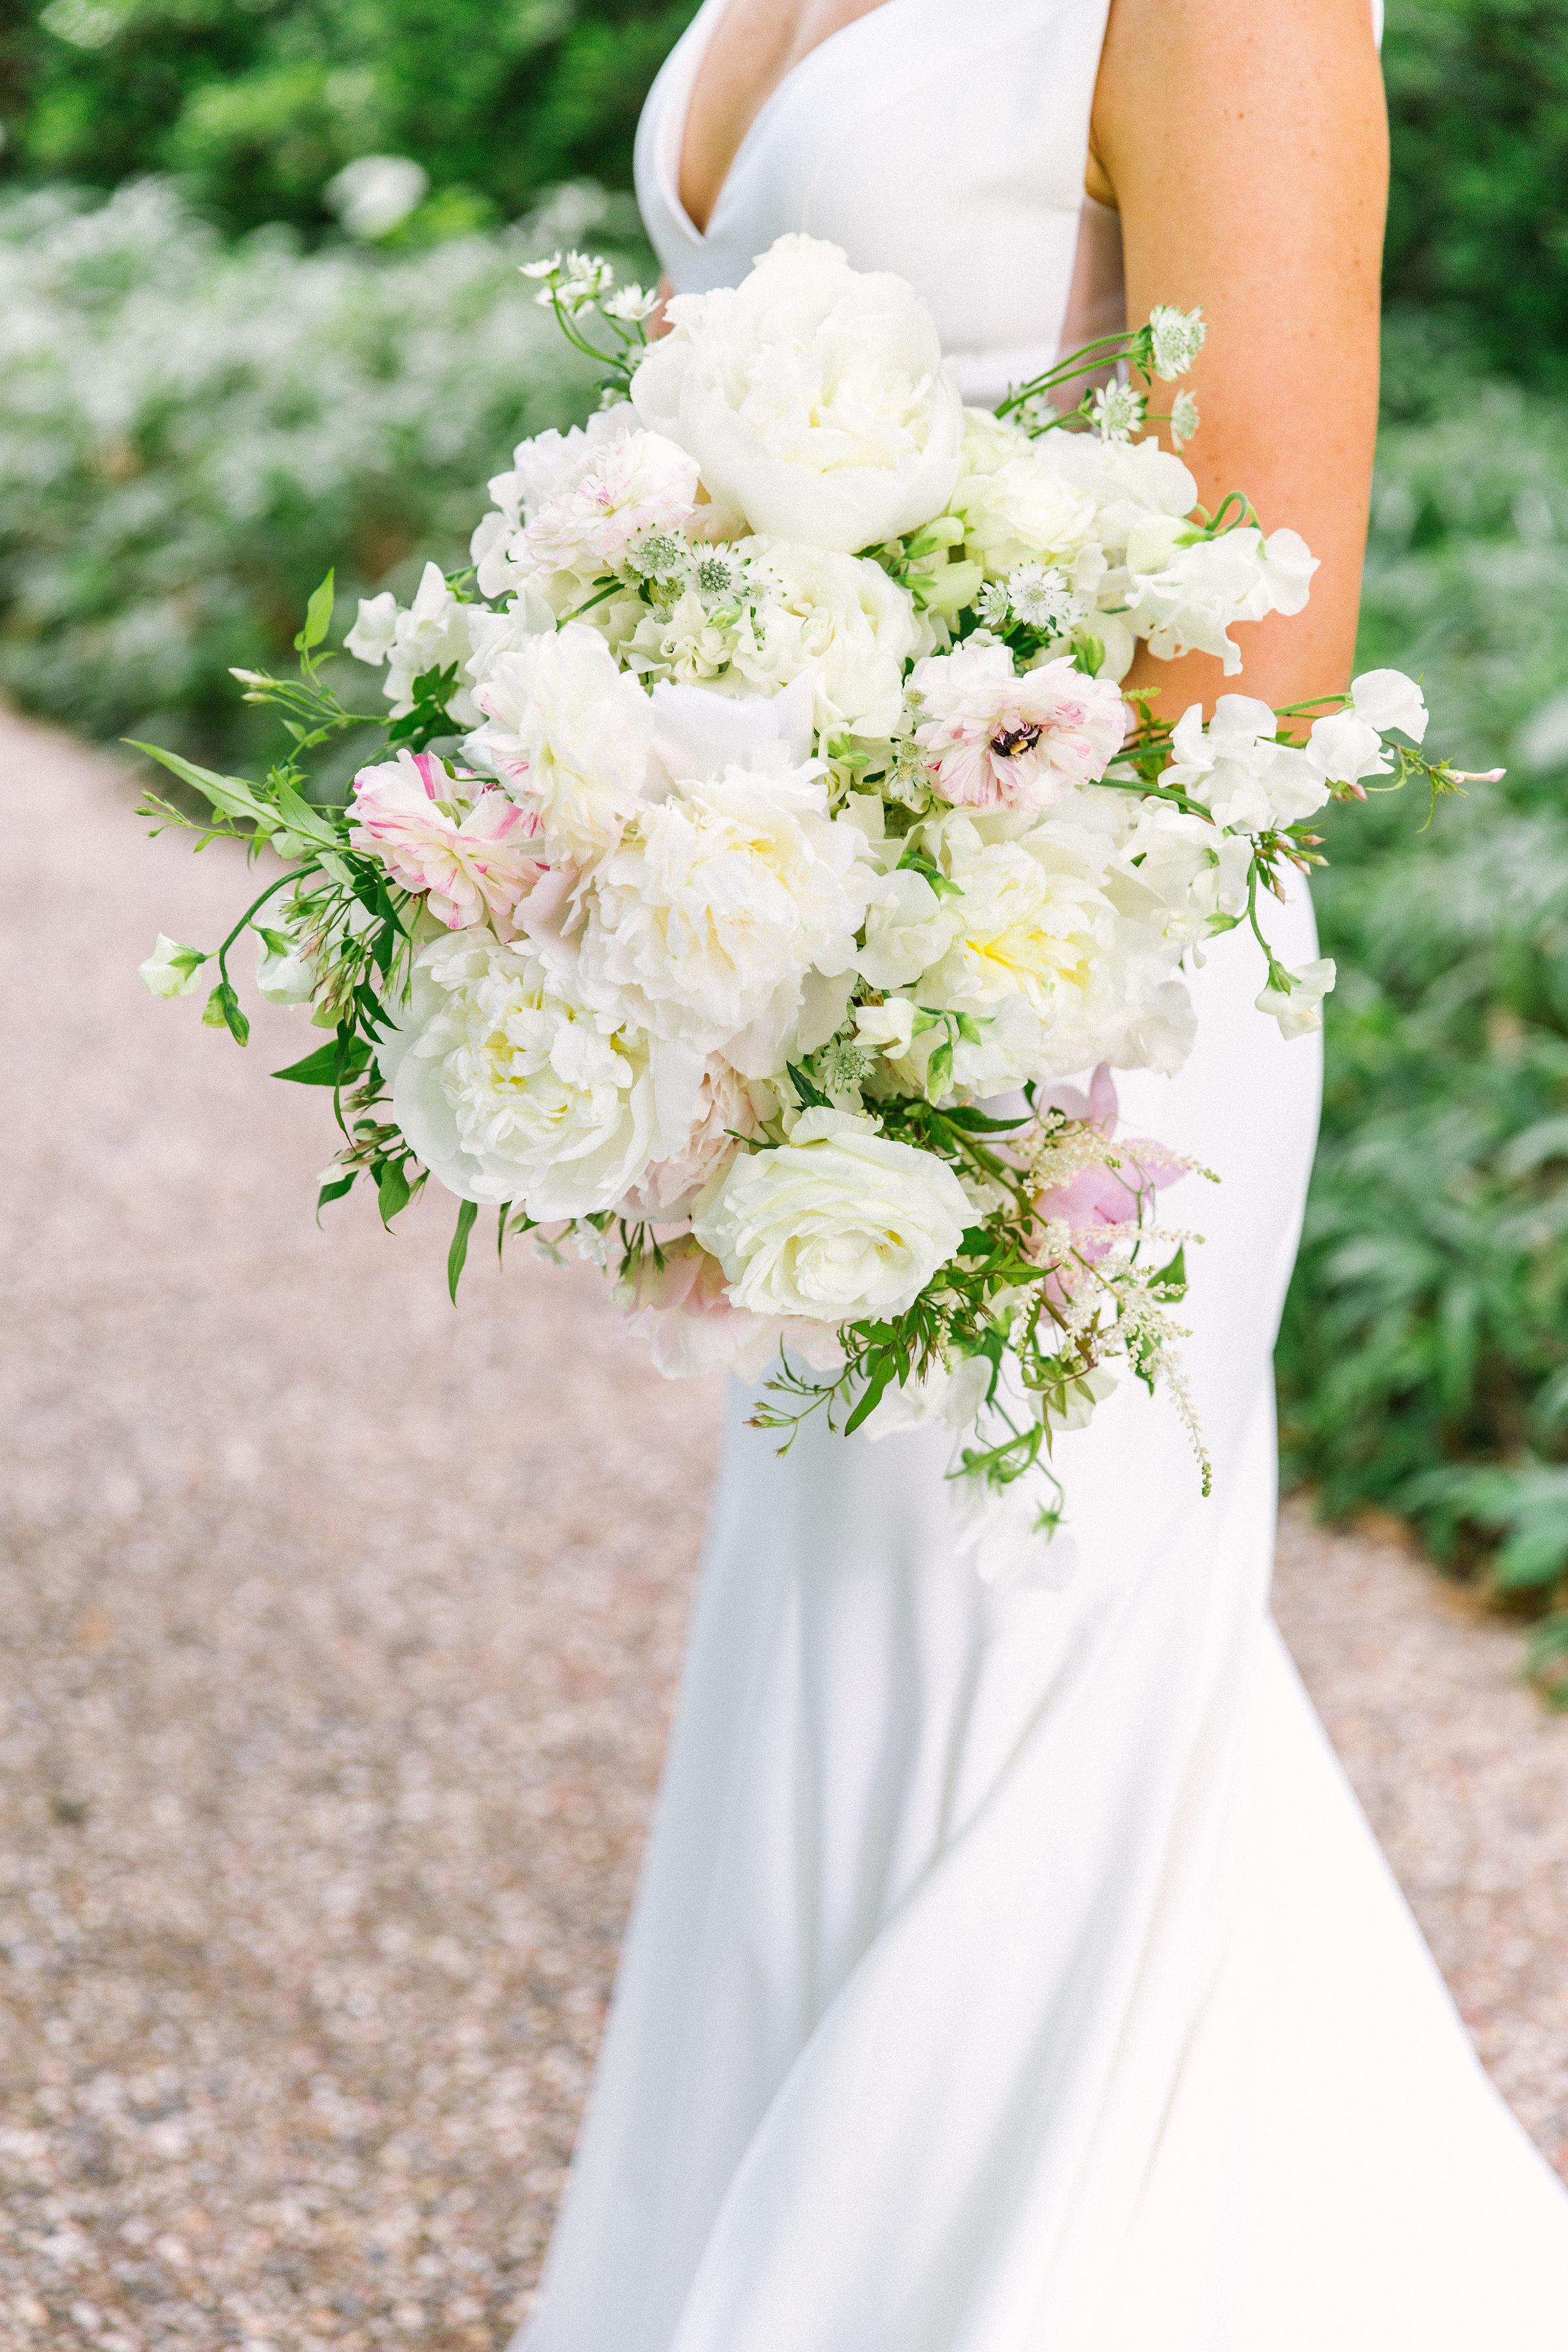 Ellen-Ashton-Photography-Dallas-Wedding-Photographers-Ivory-and-vine-Weddings-778.jpg